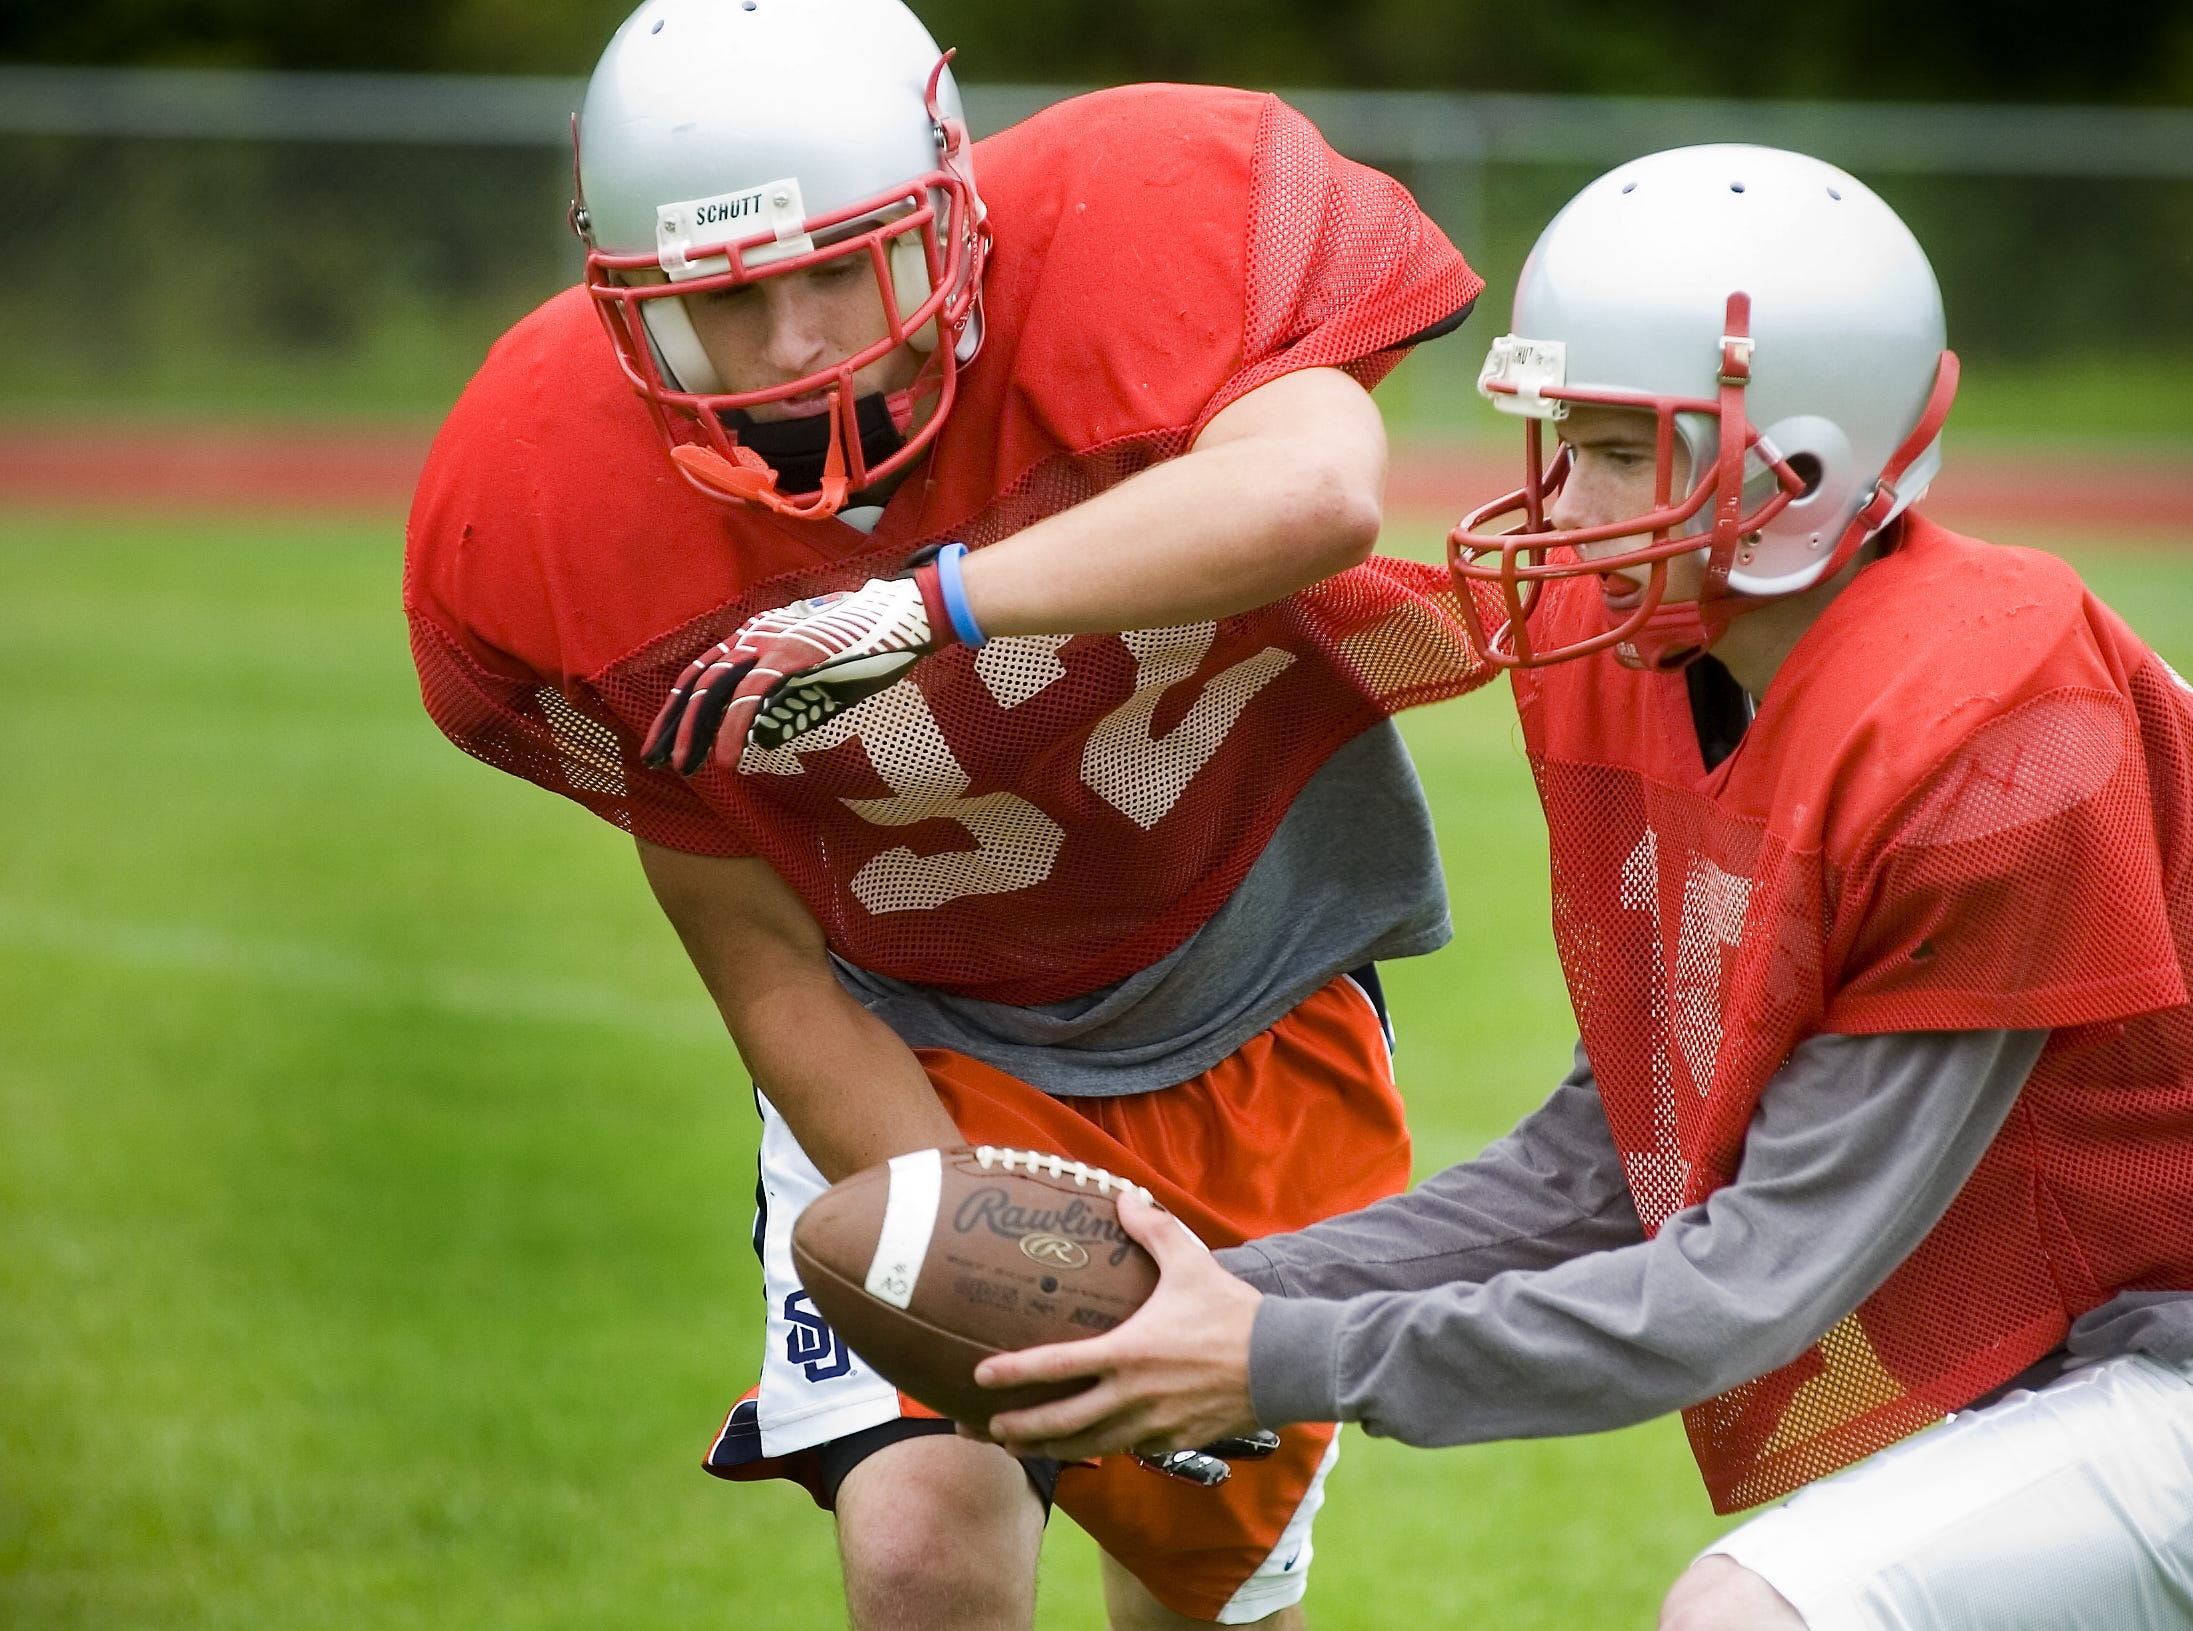 From 2007: Chenango Valley running back Trevor Cola, left, and quarterback Matt Mullins running plays during practice.